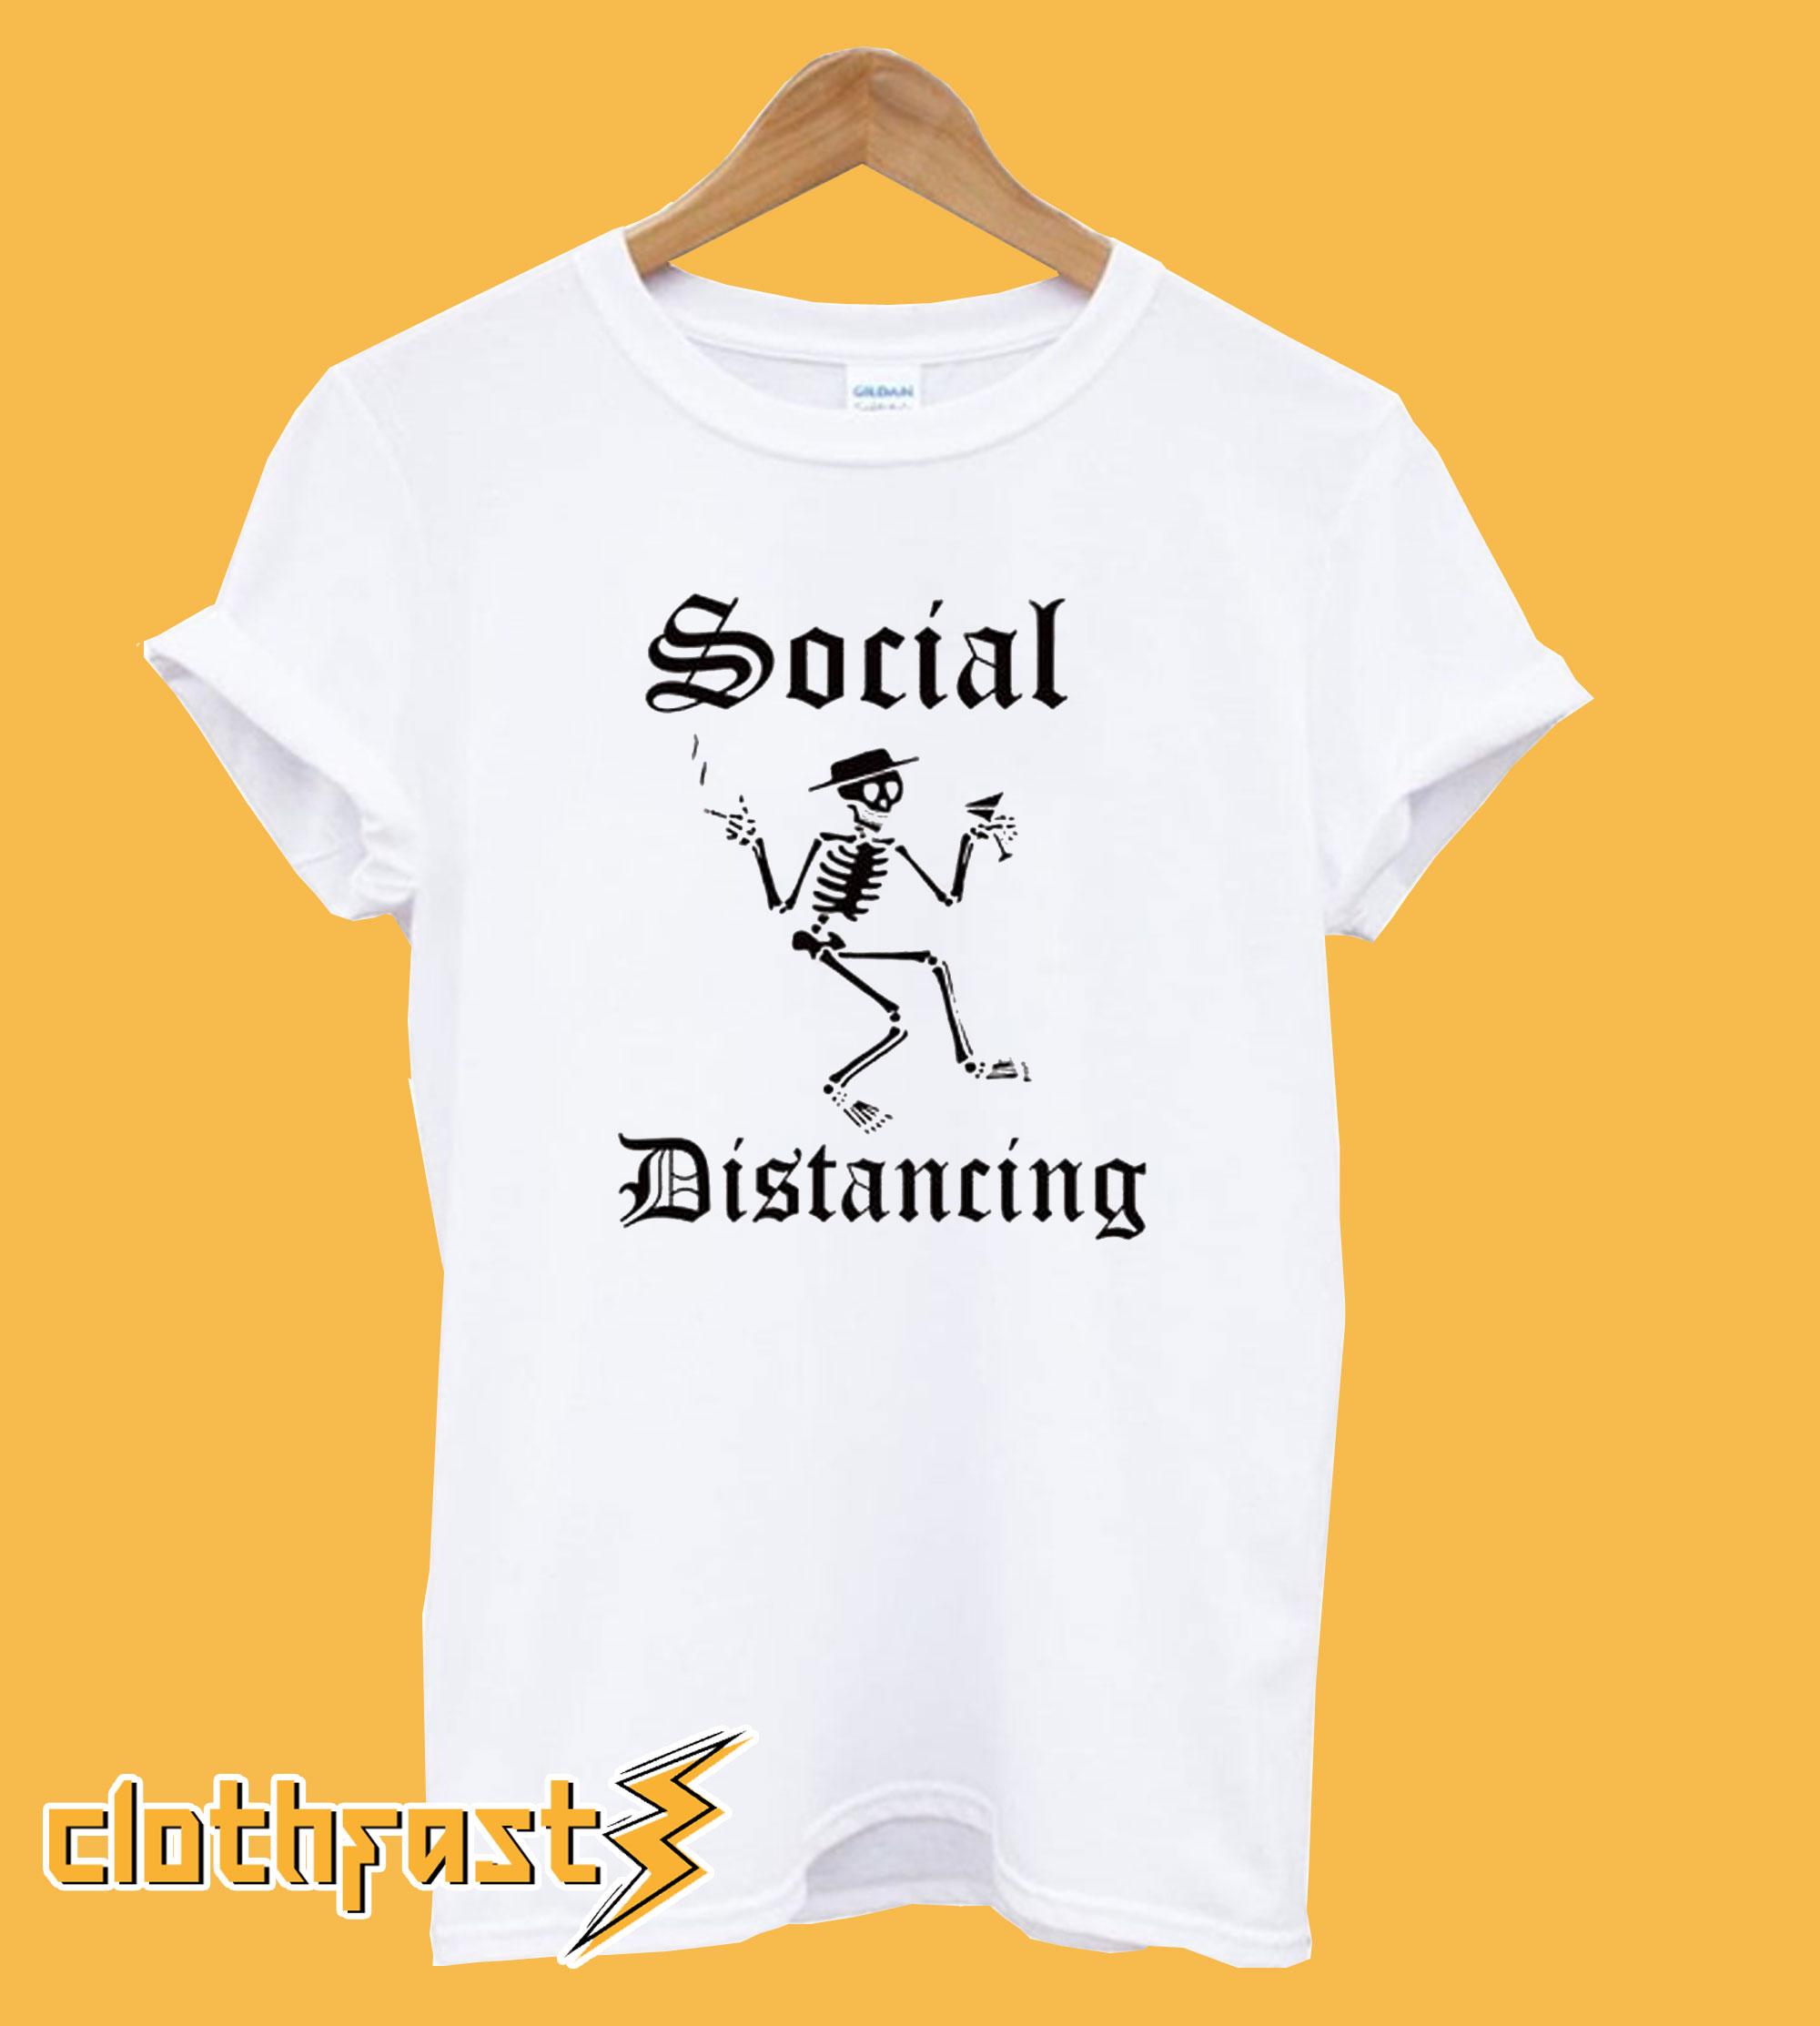 Social Distancing Parody Funny T-Shirt